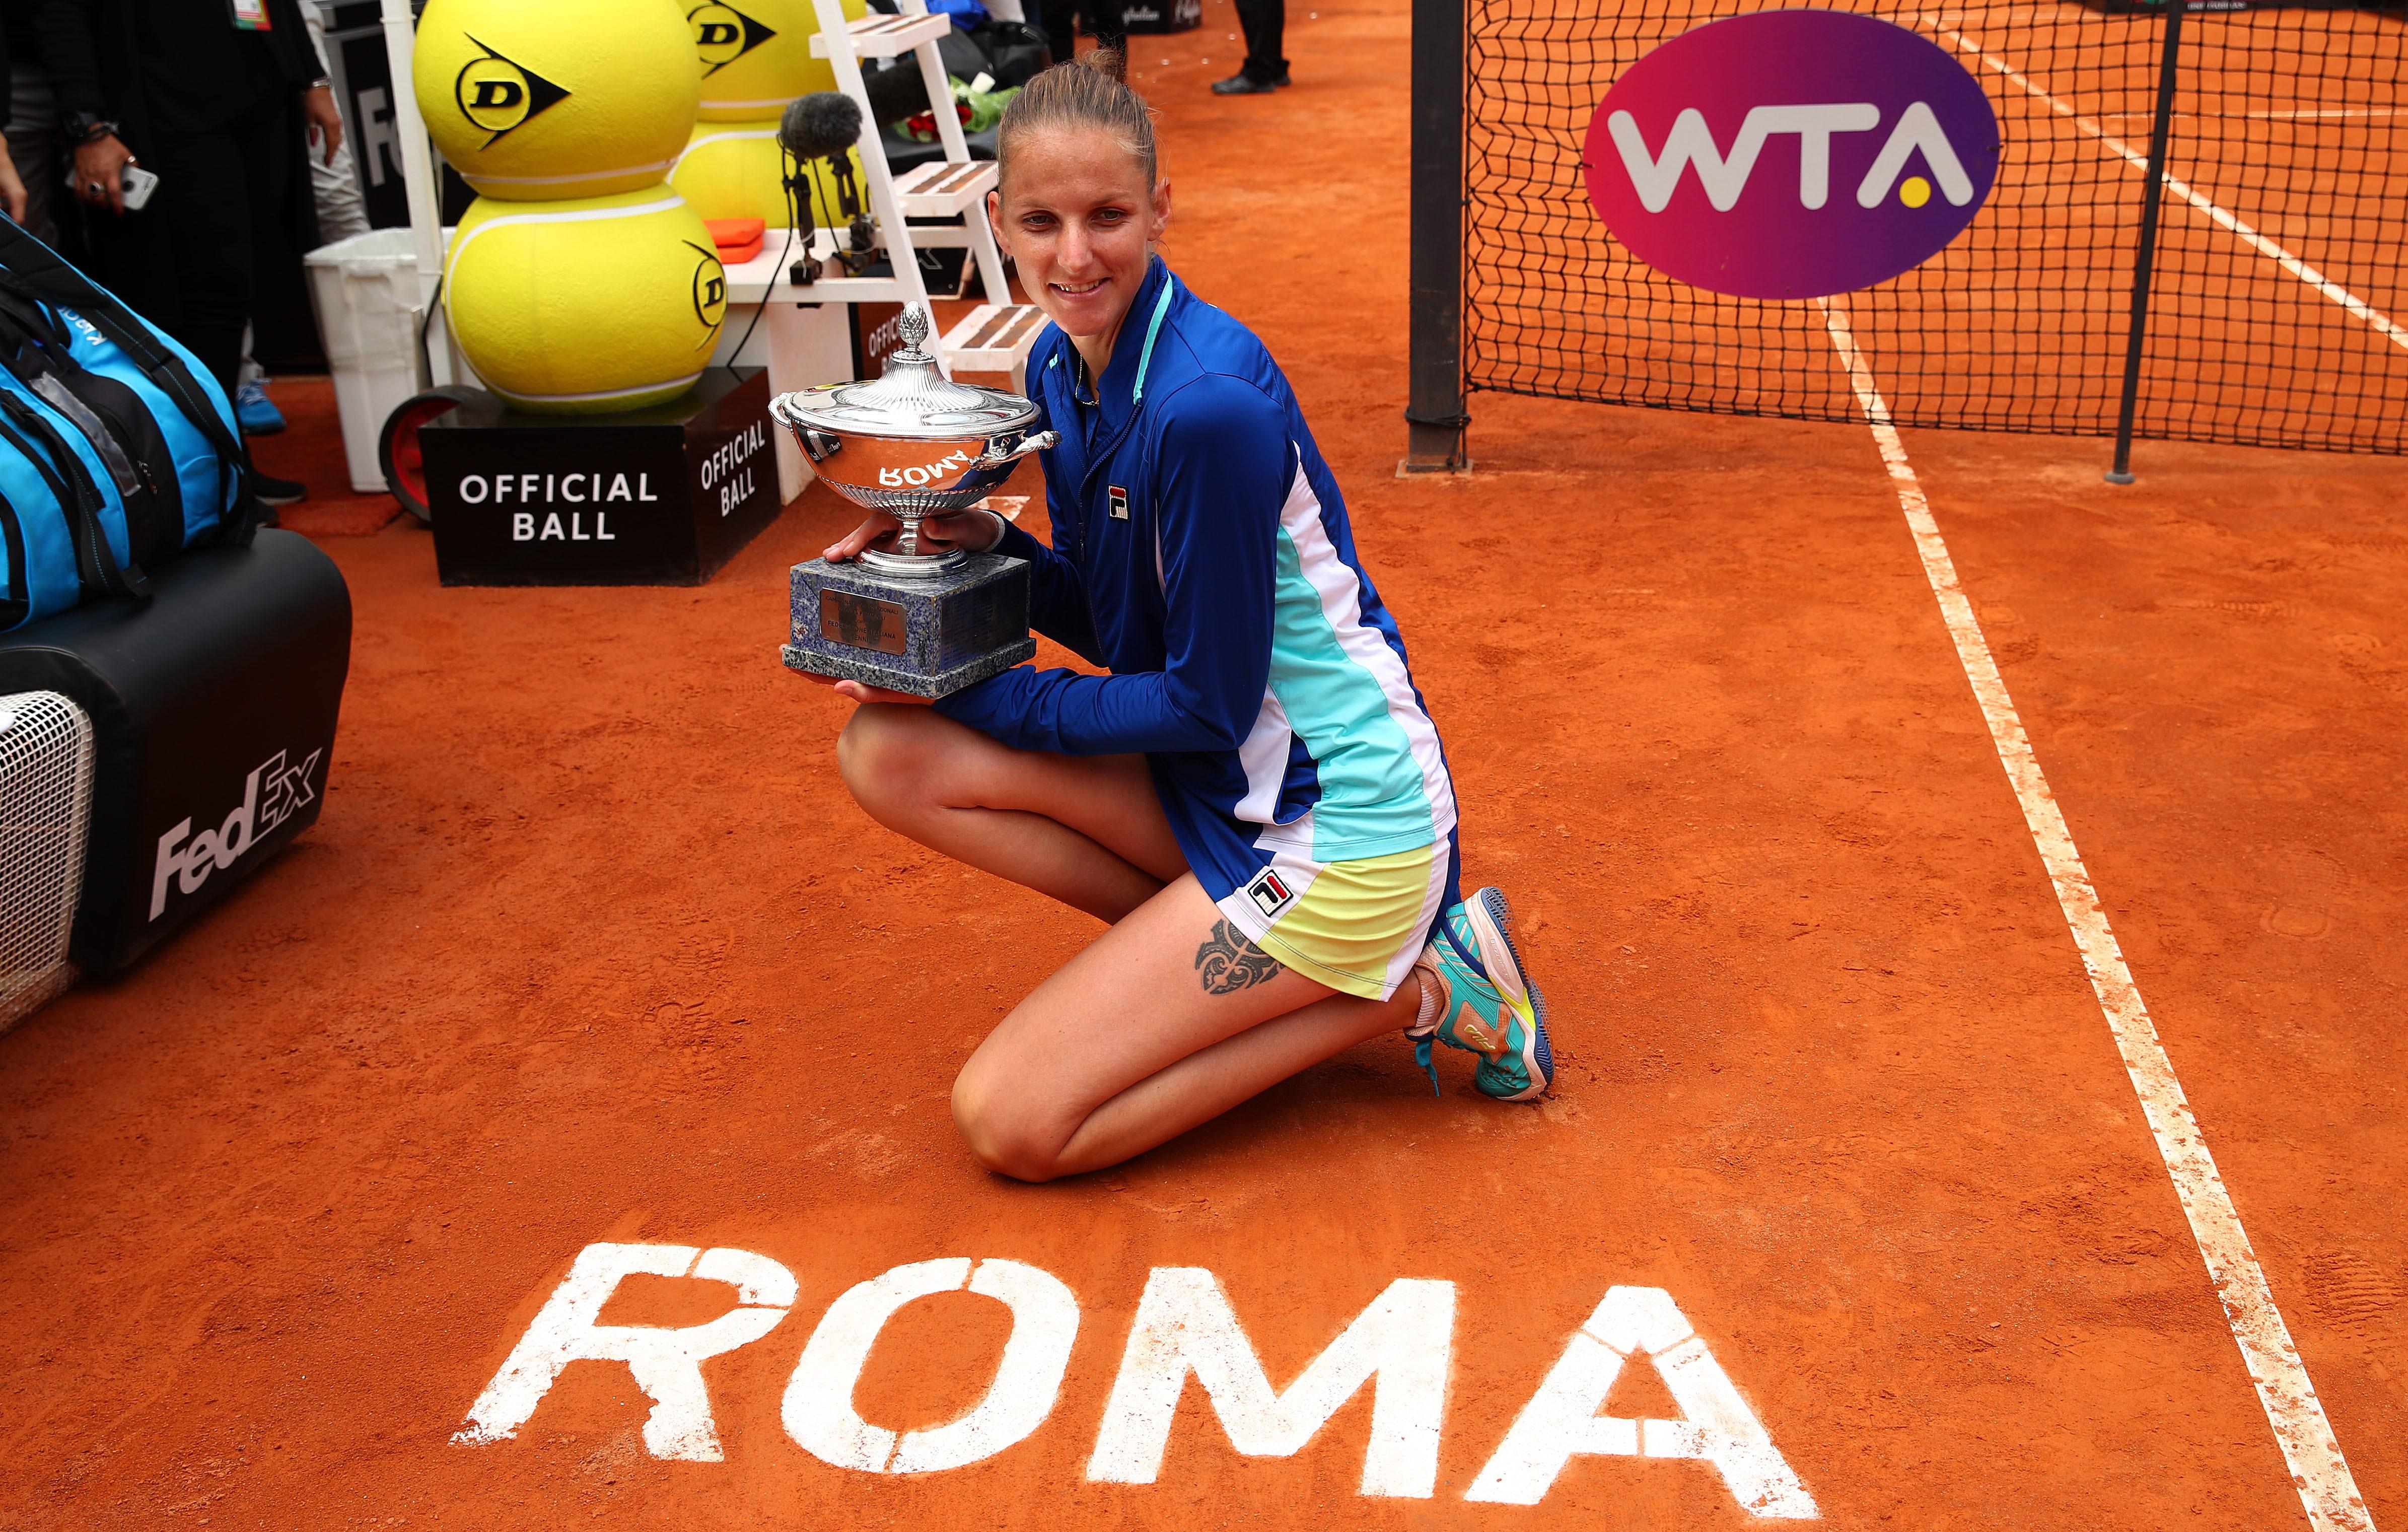 Internazionali di Roma tennis: Karolina Pliskova